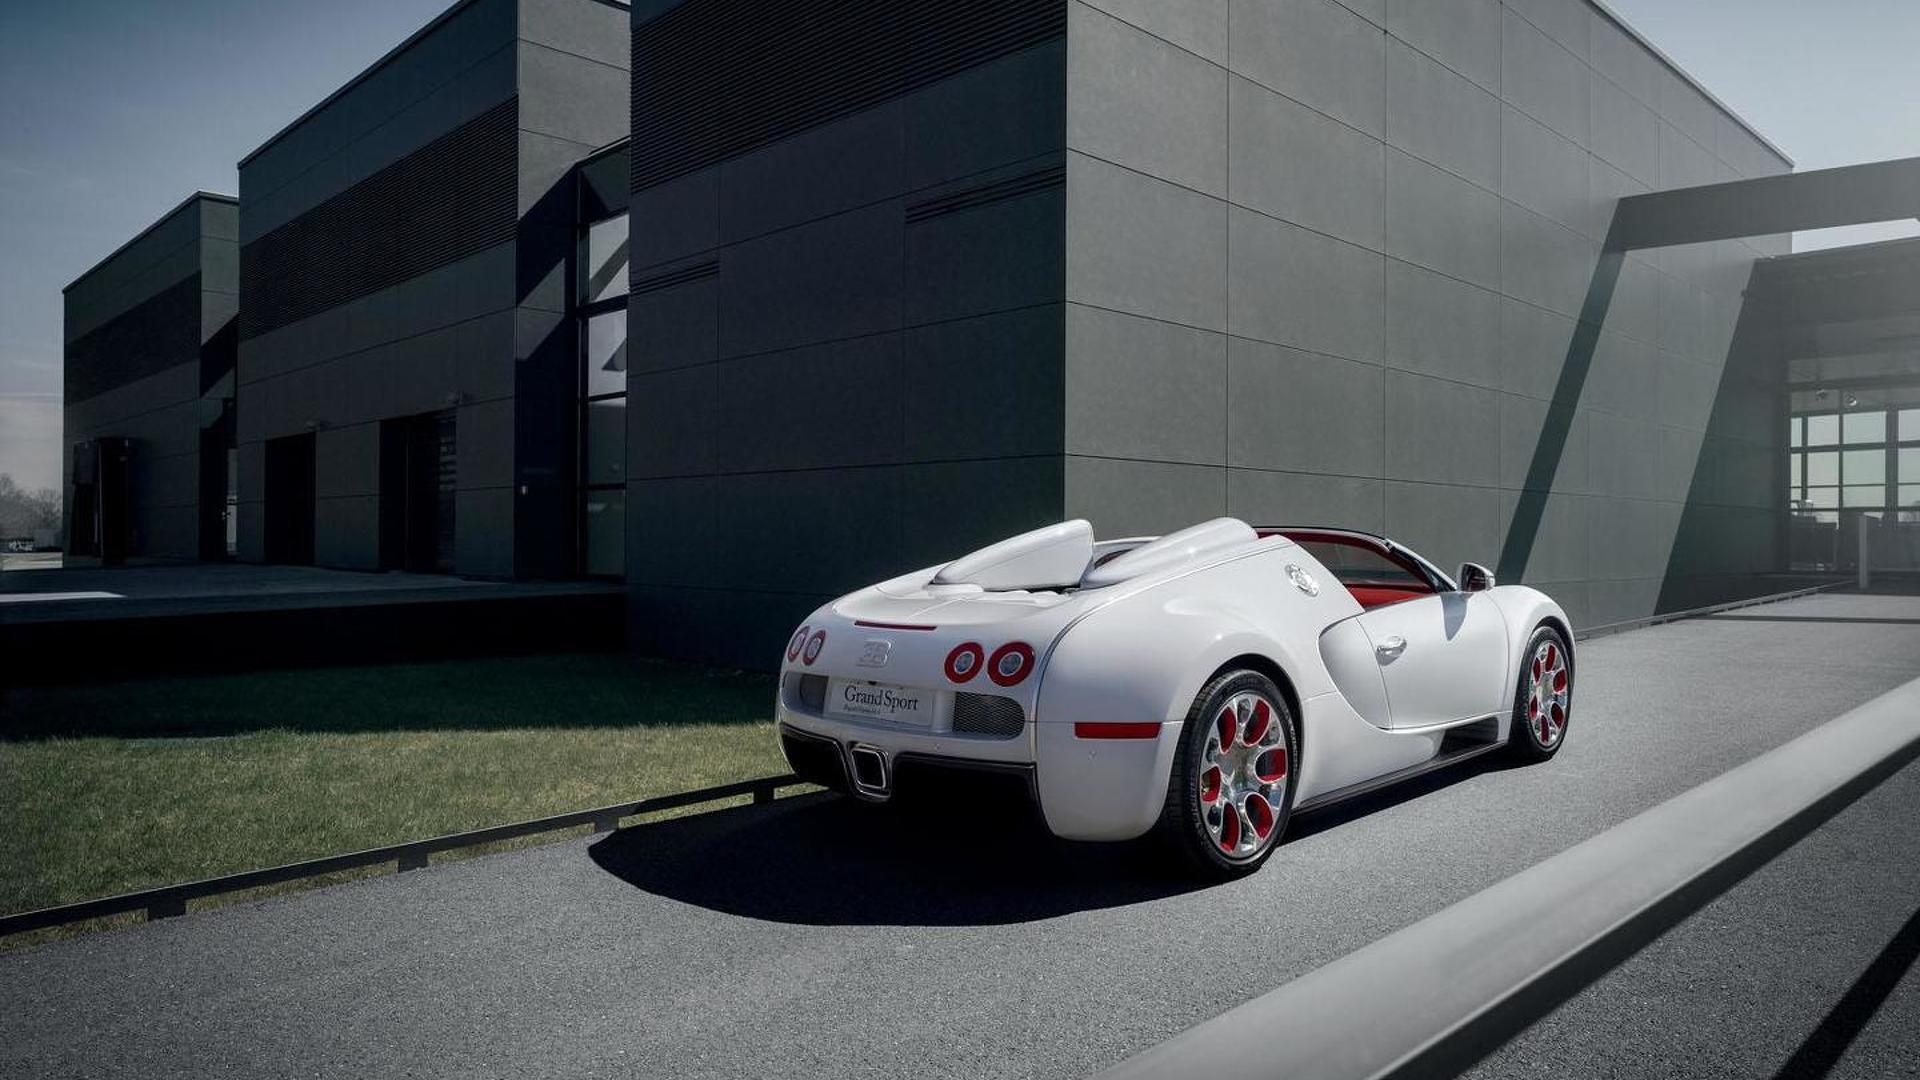 2012-310997-bugatti-veyron-grand-sport-wei-long-special-edition-23-4-20121 Amazing Bugatti Veyron Price In Australia Cars Trend